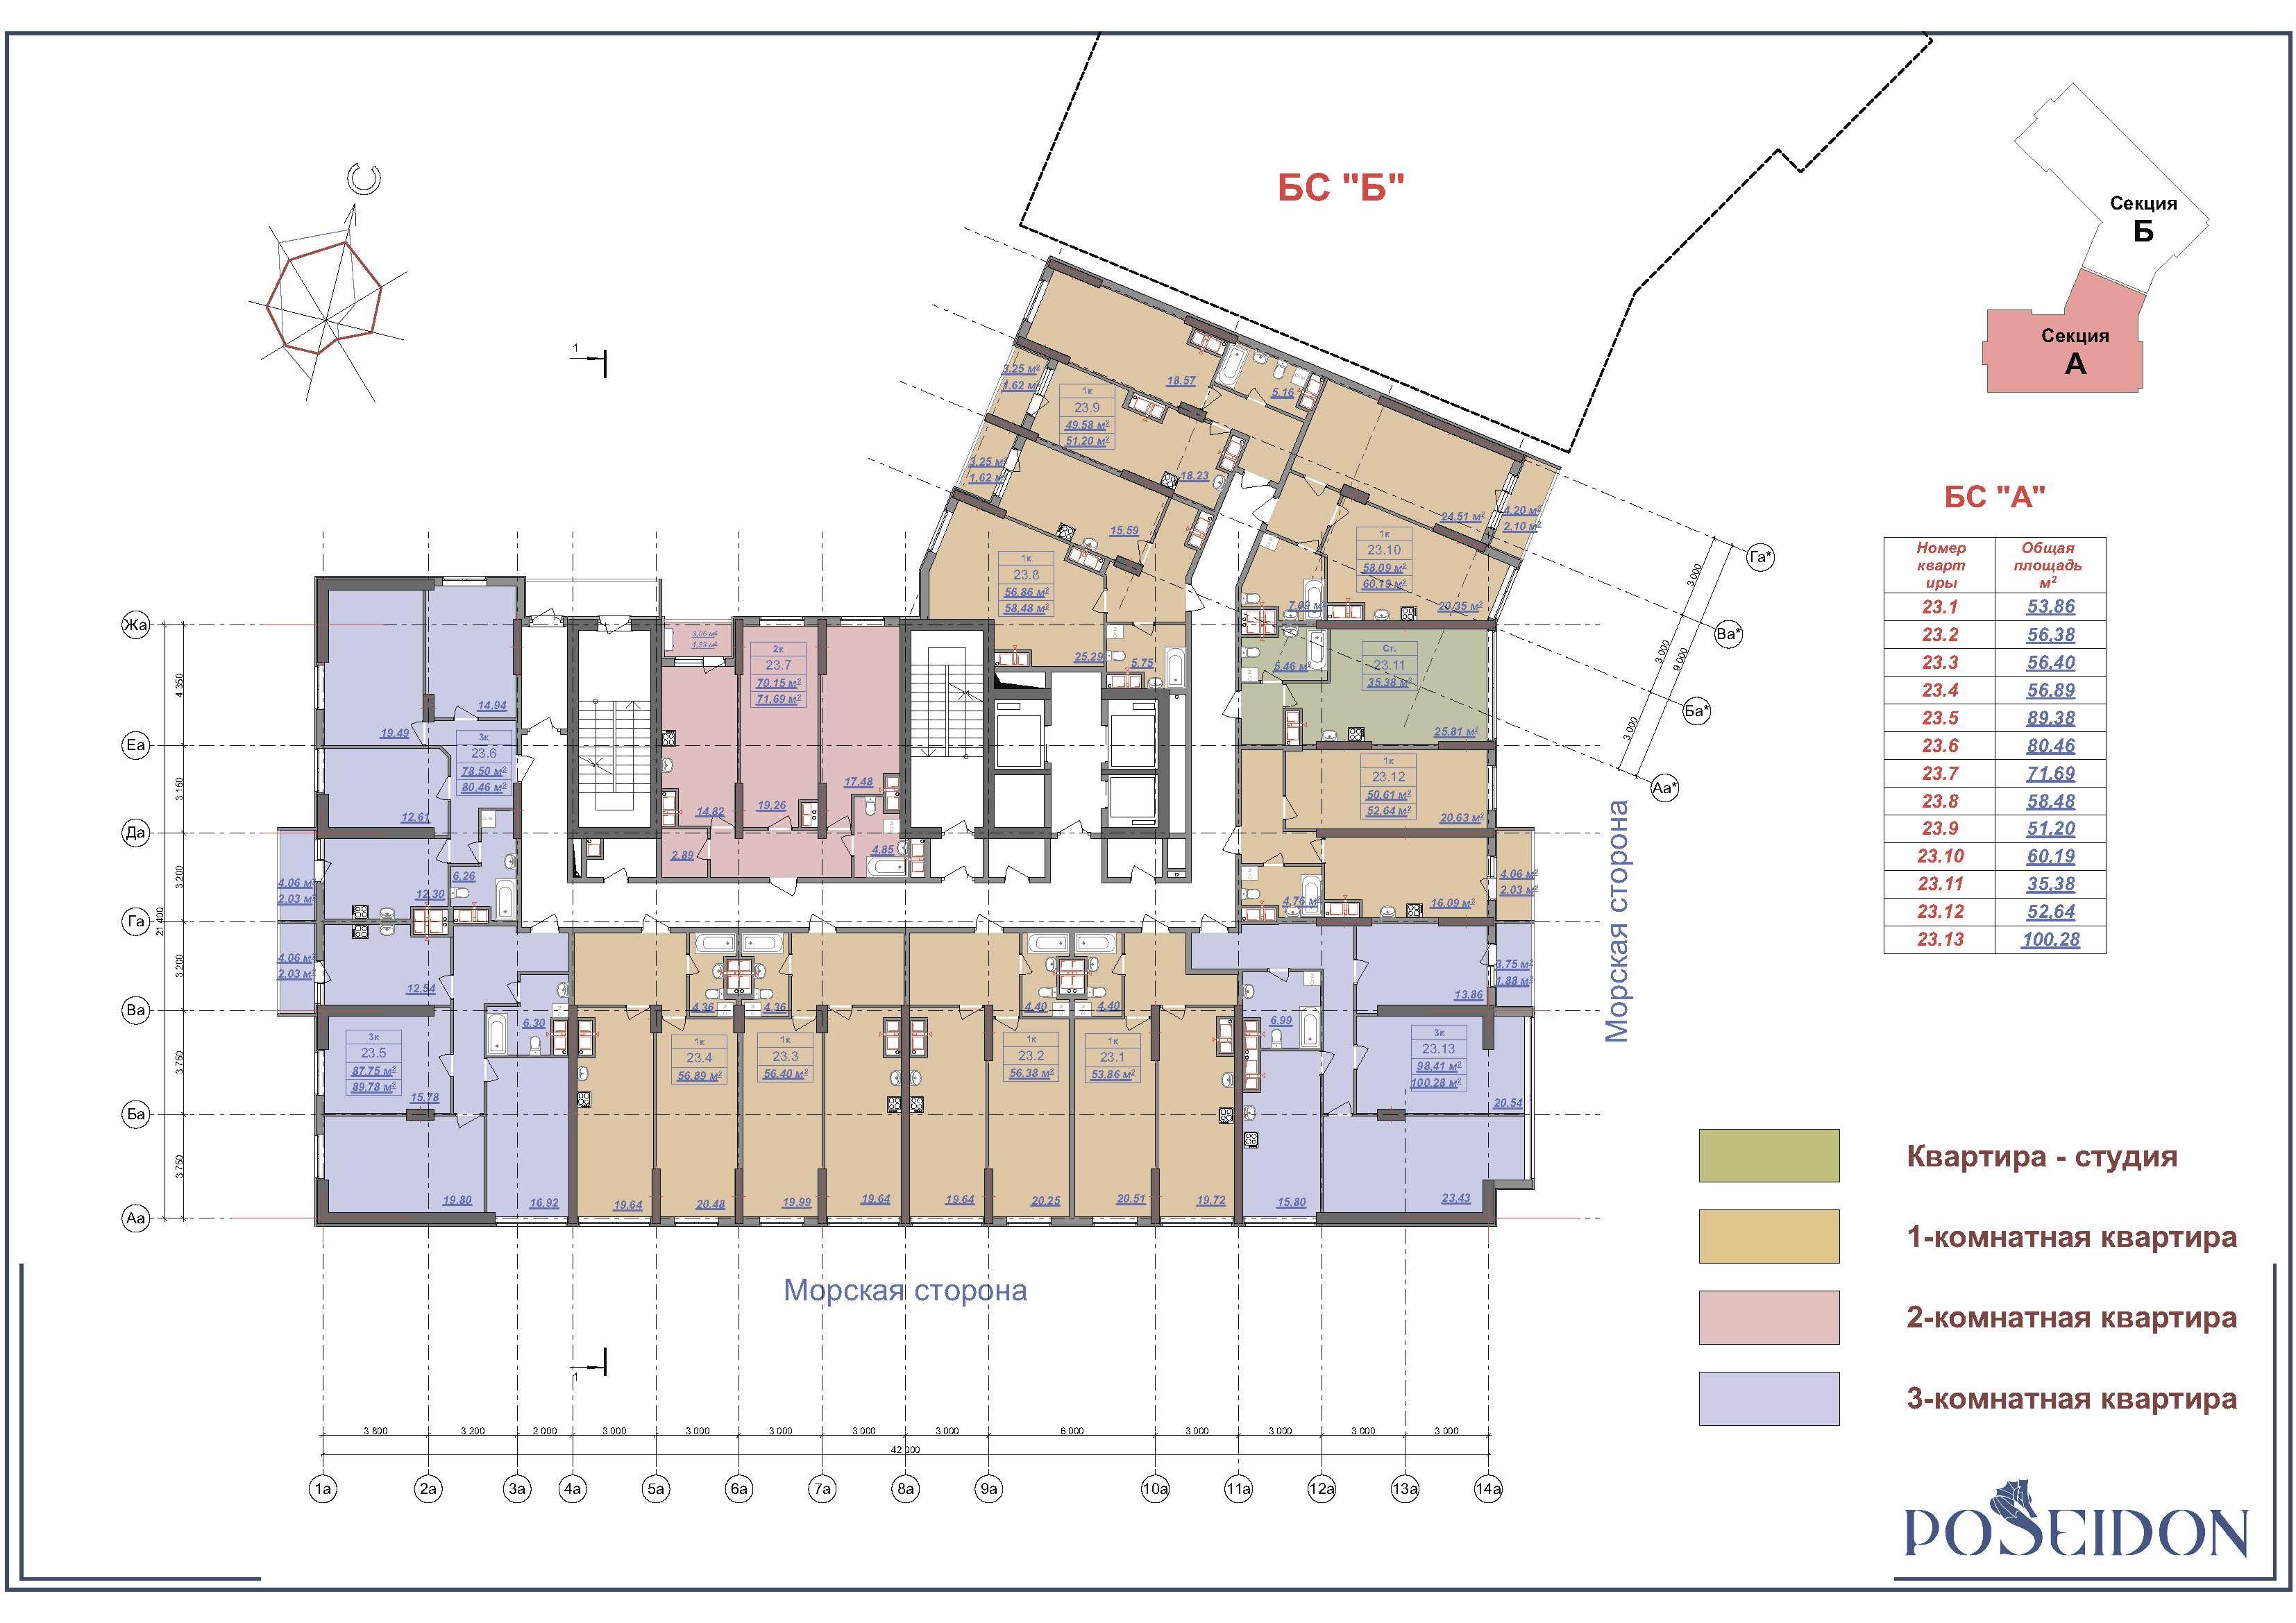 ЖК Посейдон план 23 этажа